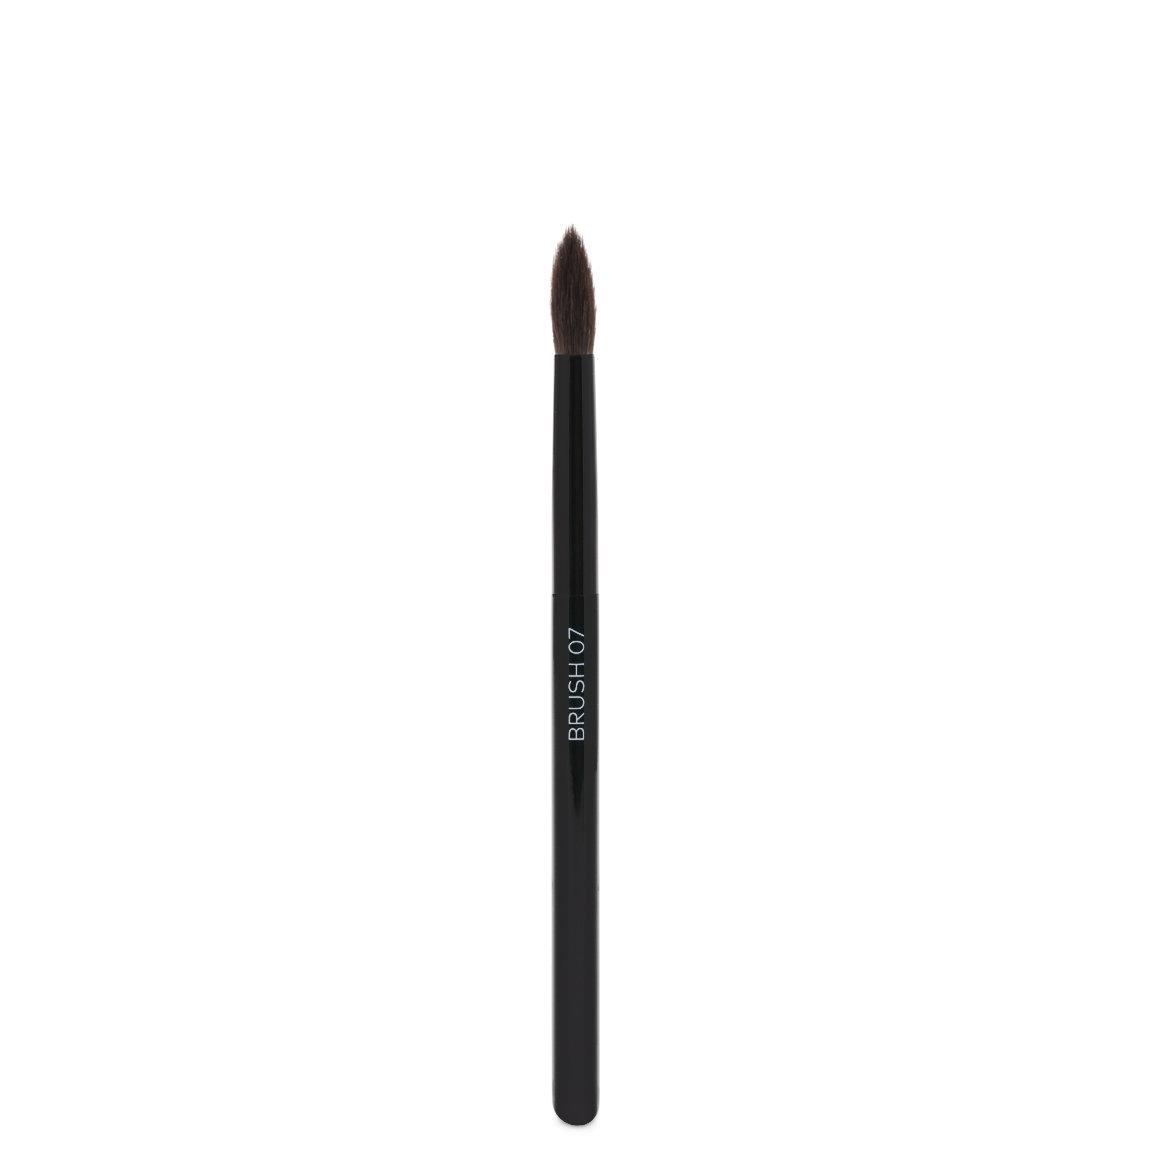 Beautylish Presents Yano Series Brush 07 Tapered Eyeshadow alternative view 1 - product swatch.